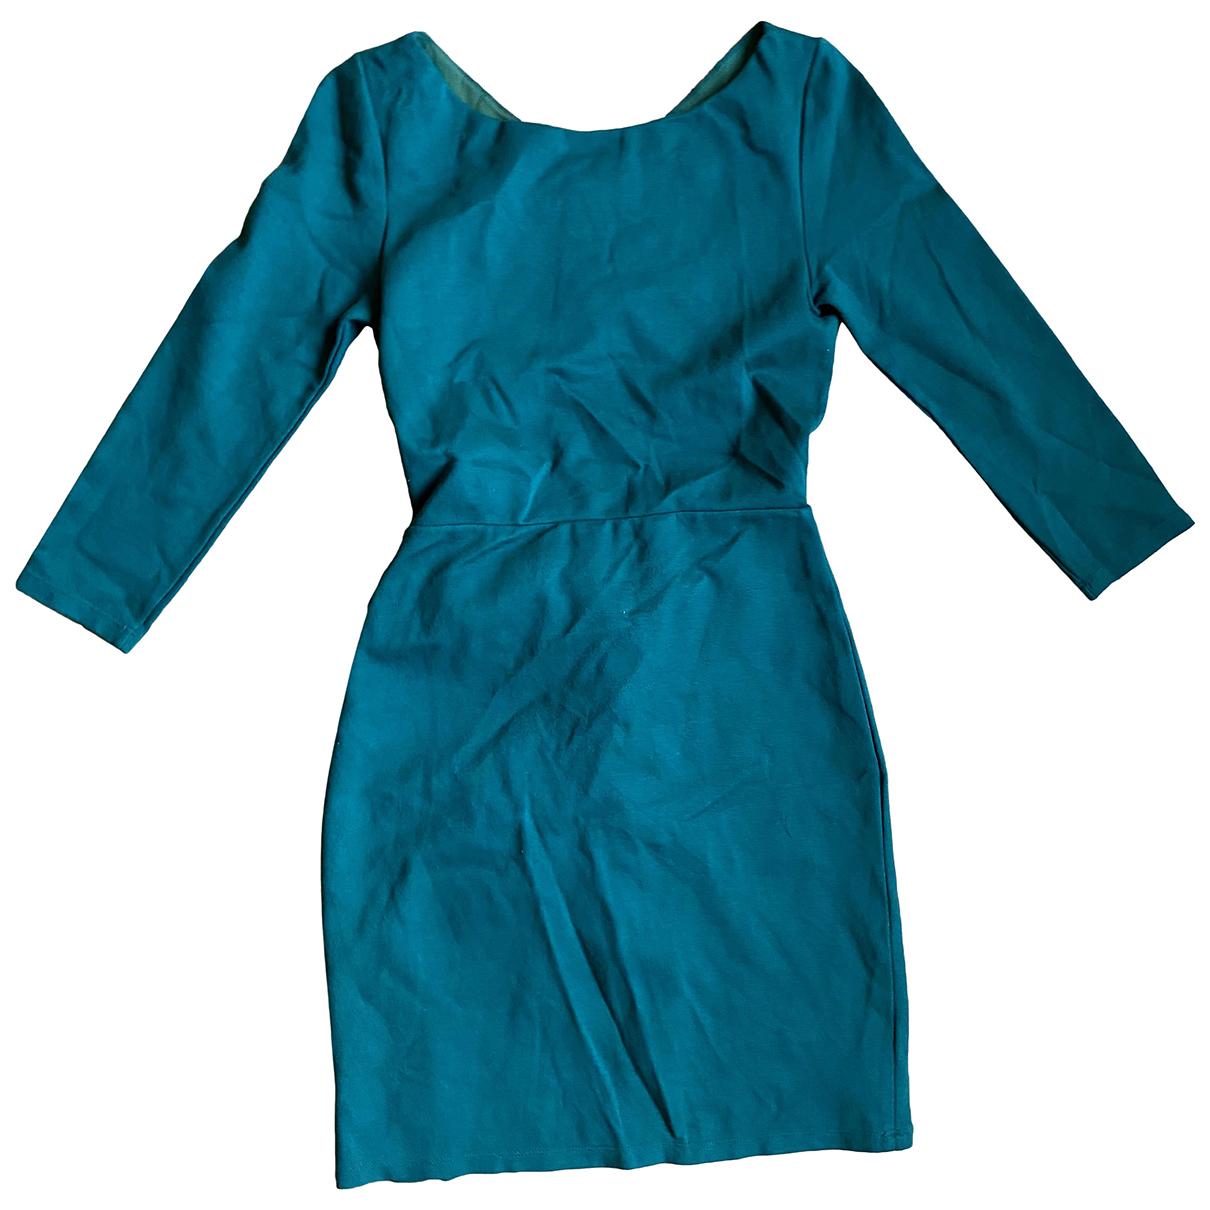 Alice & Olivia \N Green Cotton - elasthane dress for Women 36 FR